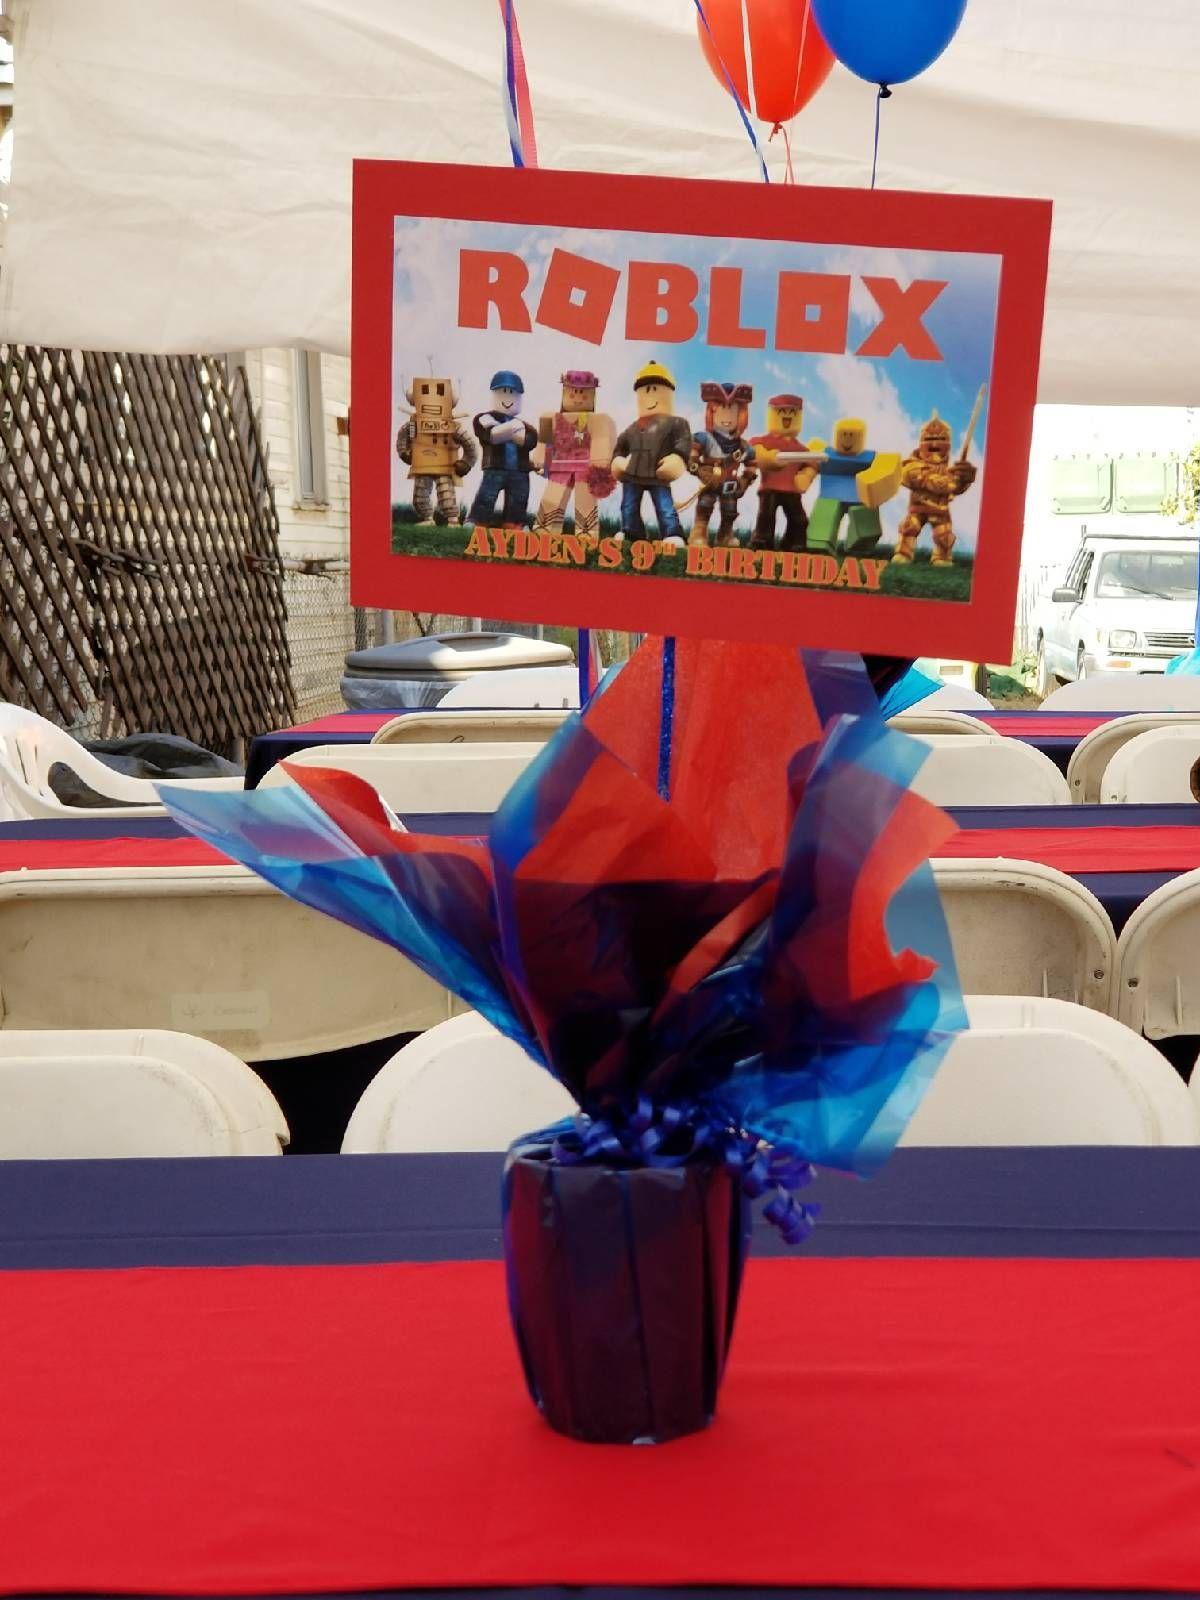 Roblox Centerpieces Roblox Birthday Party Robot Birthday Party Roblox Birthday Party Ideas